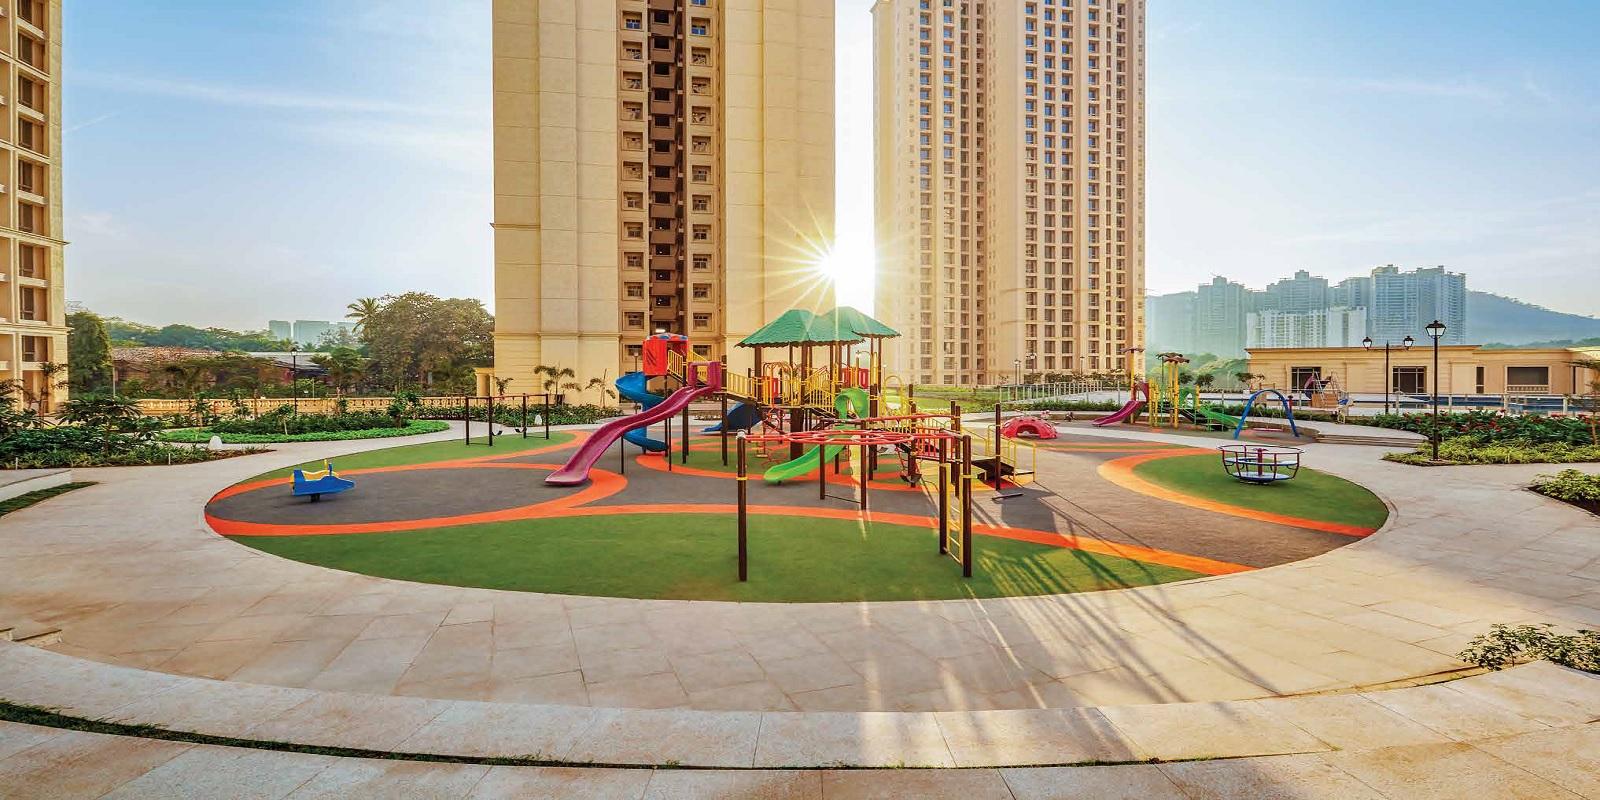 hiranandani park clifton project amenities features2